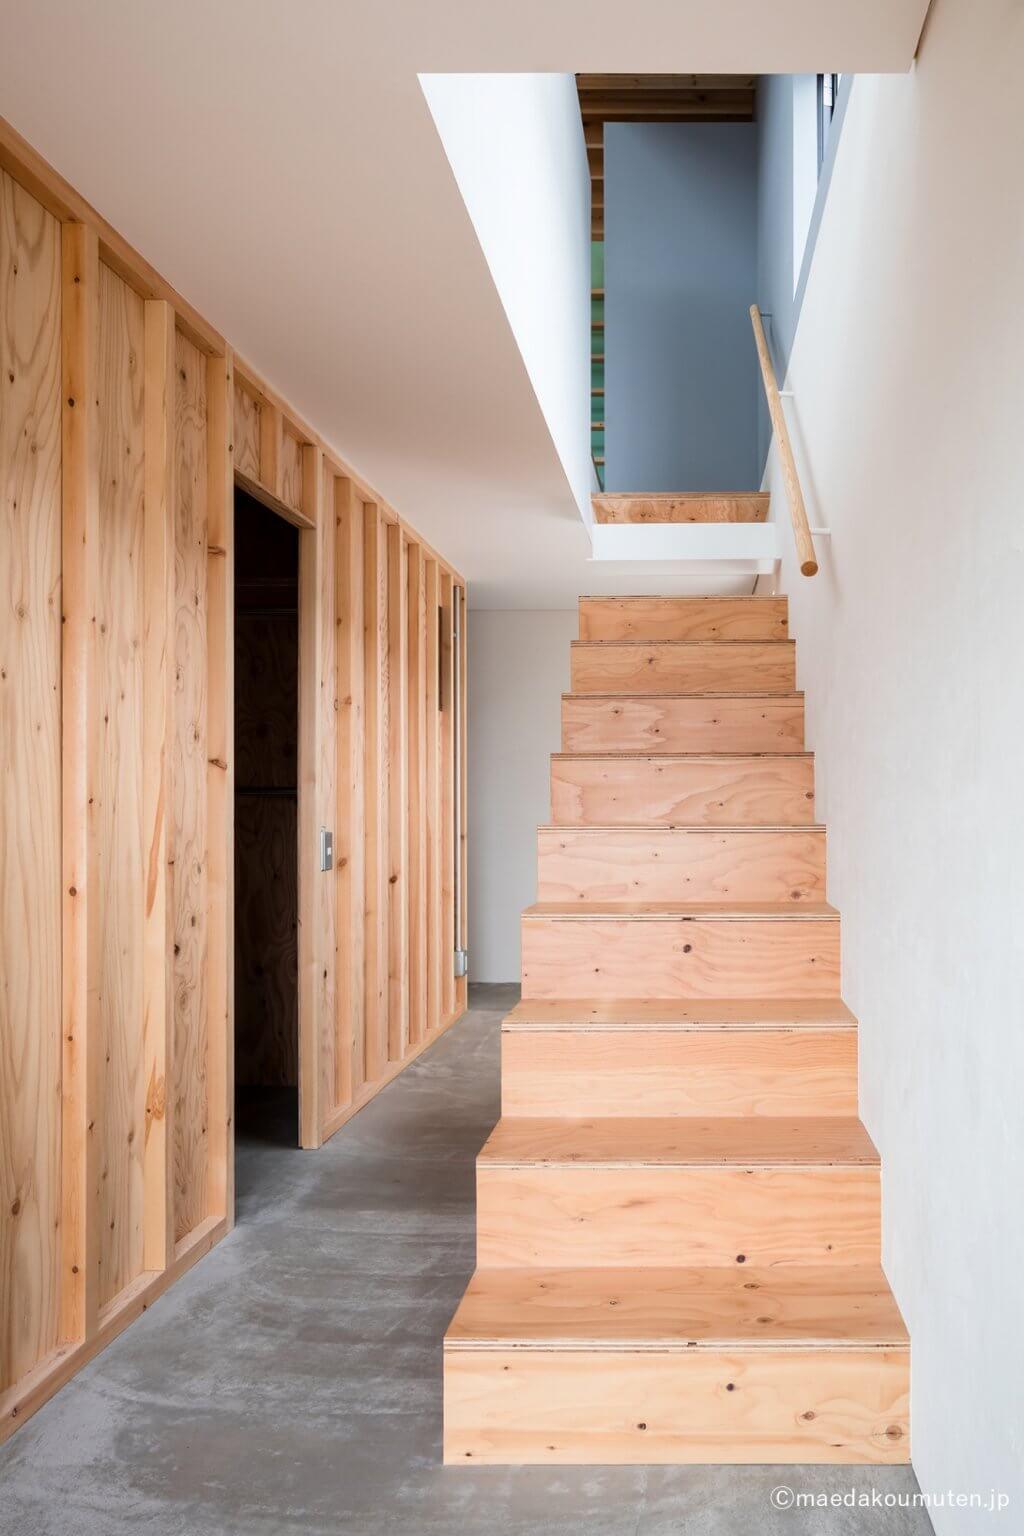 神奈川、工務店、注文住宅、デザイン住宅、建築家、磯部の家、15